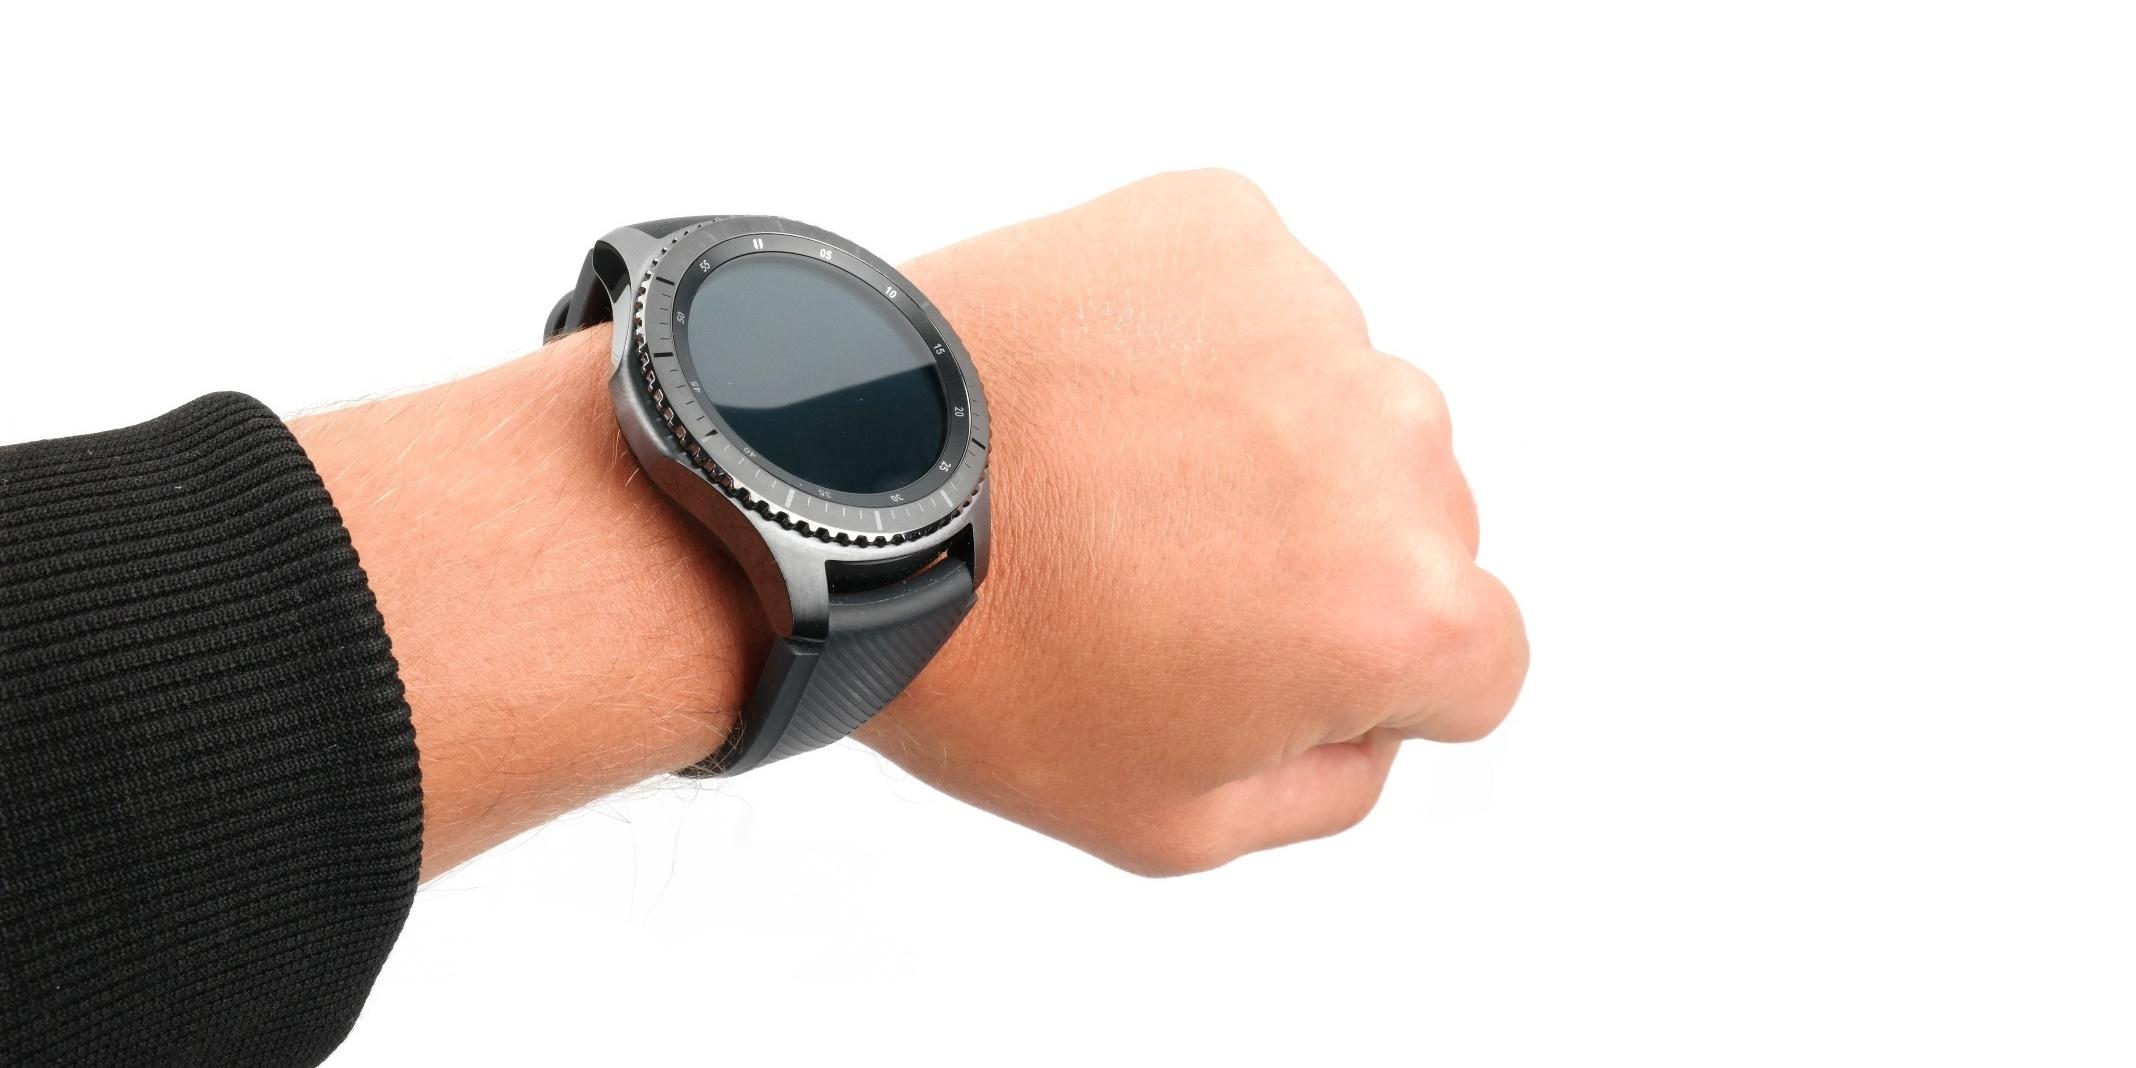 bd07f654688 Samsung Gear S3 Frontier  nová generace nastupuje  recenze  –  SamsungMania.cz